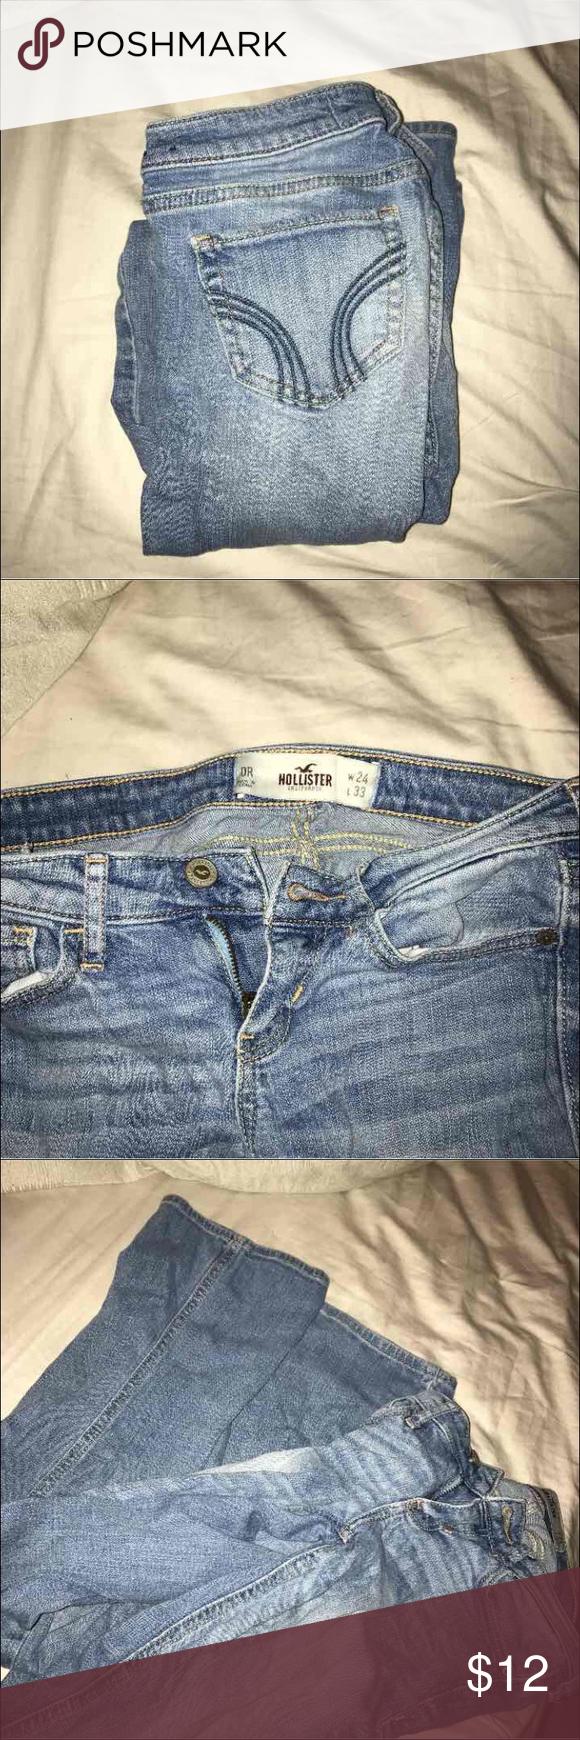 JEANS Hollister jeans for sale! Size:0R color: light wash.   Condition: GOOD Hollister Jeans Boot Cut